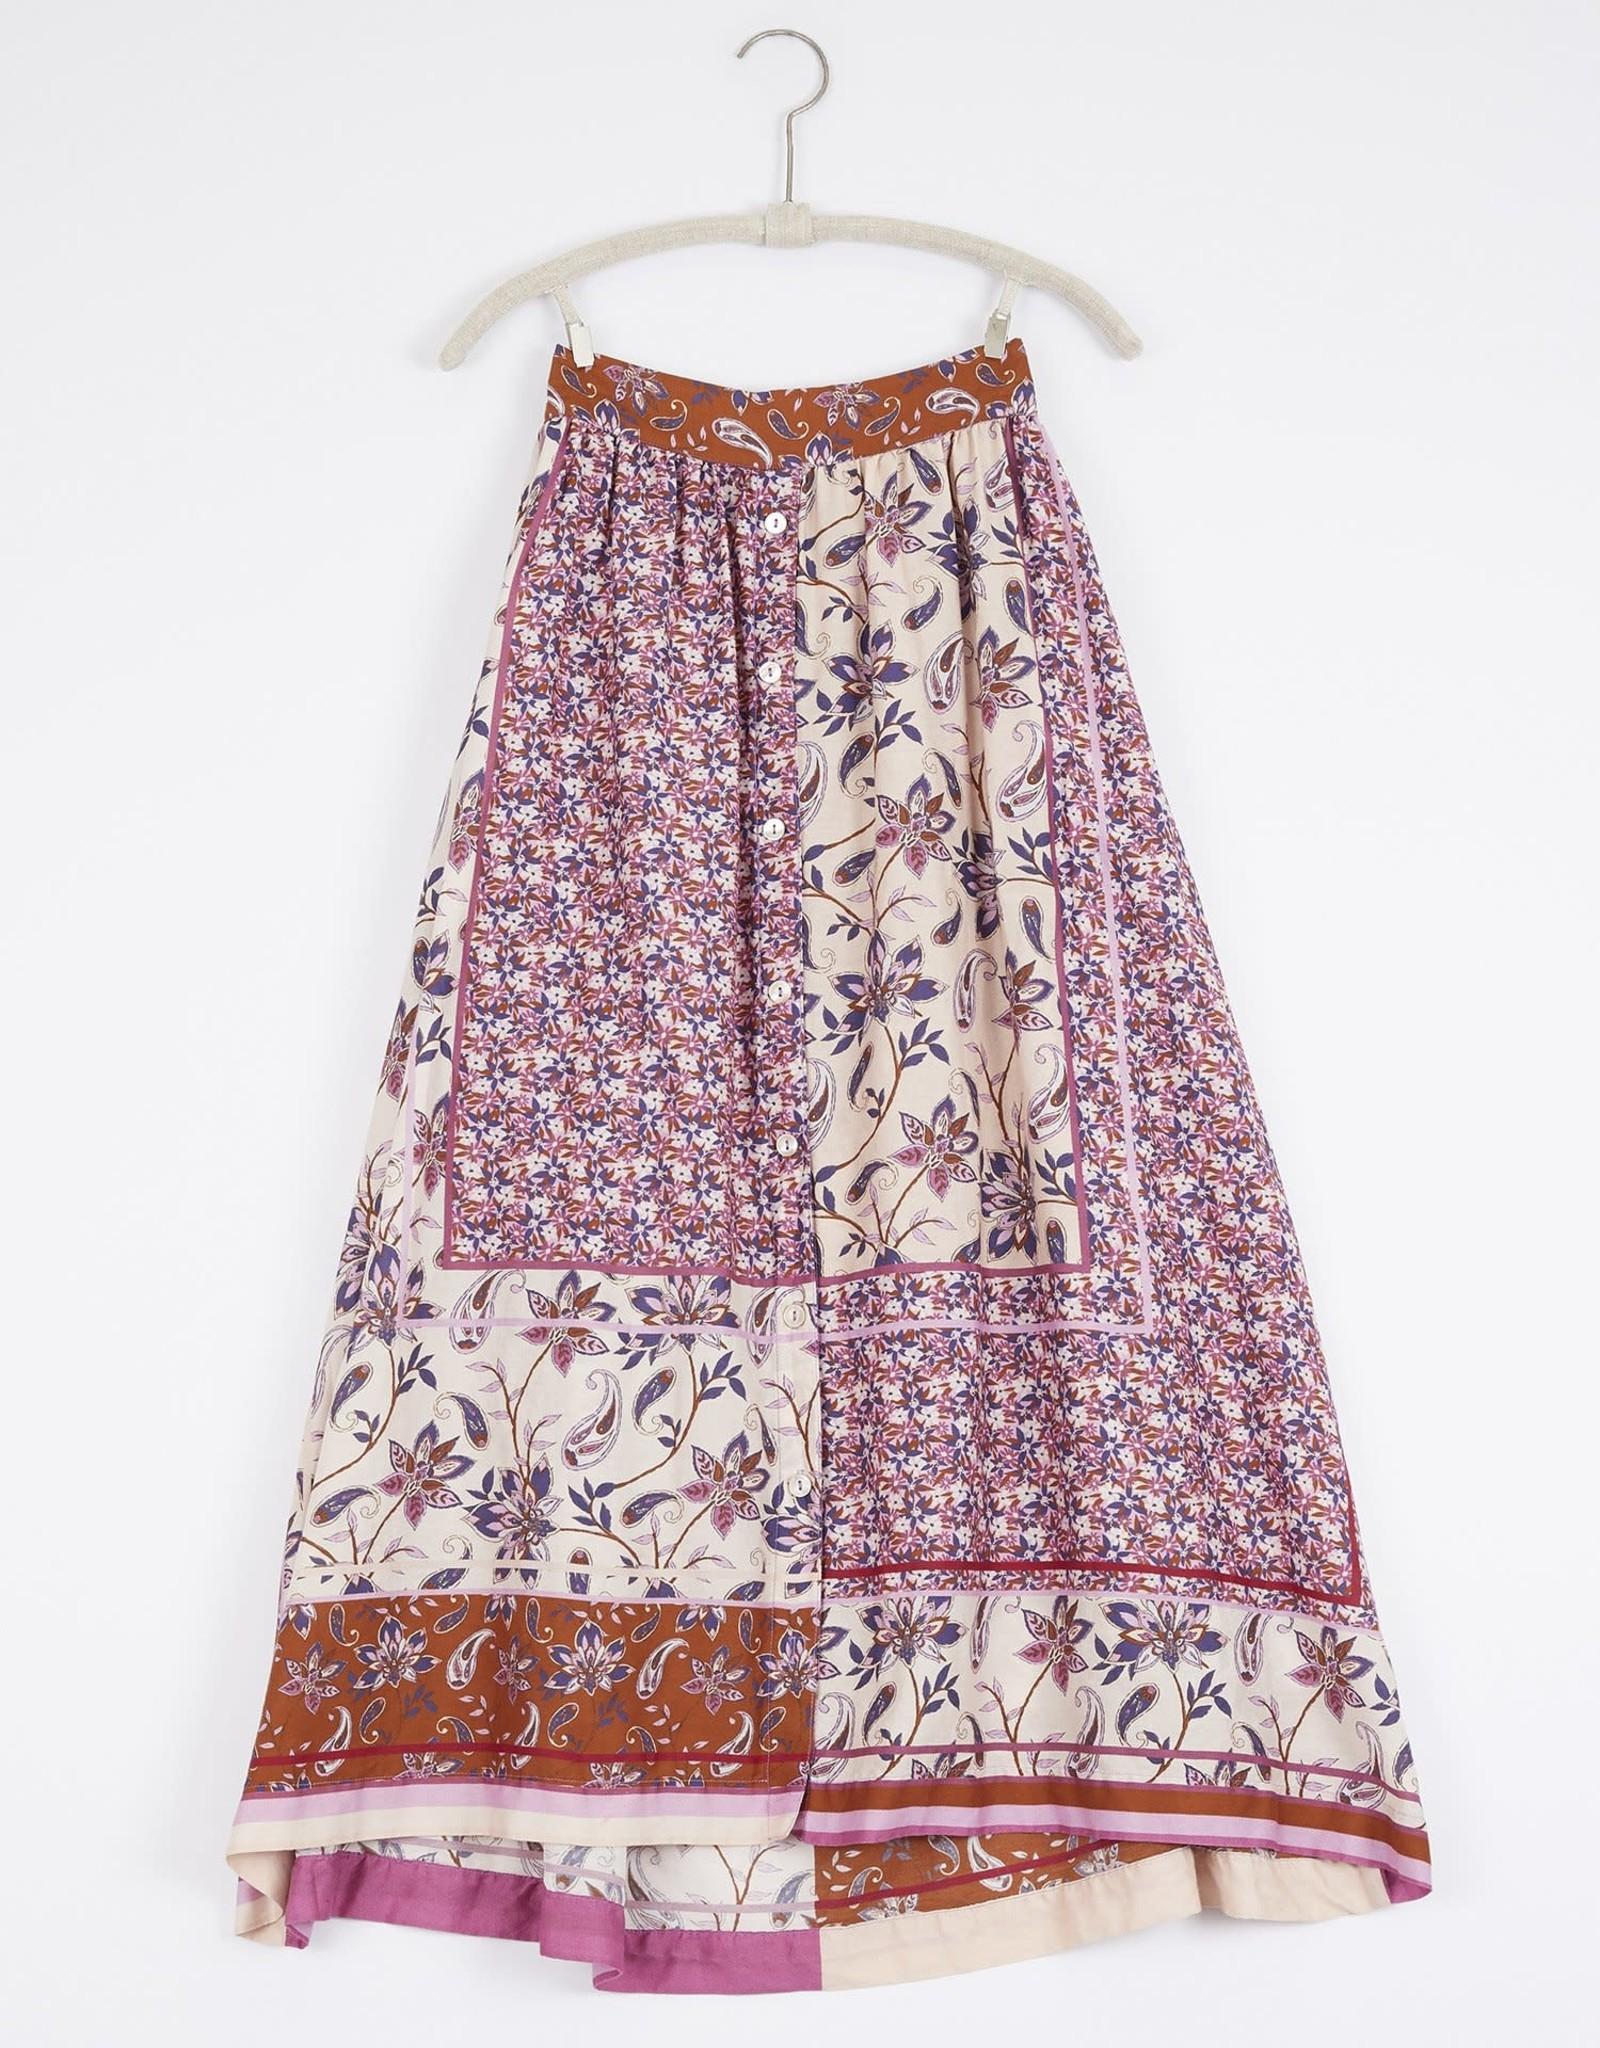 Xirena Xirena Teagan Skirt Trail